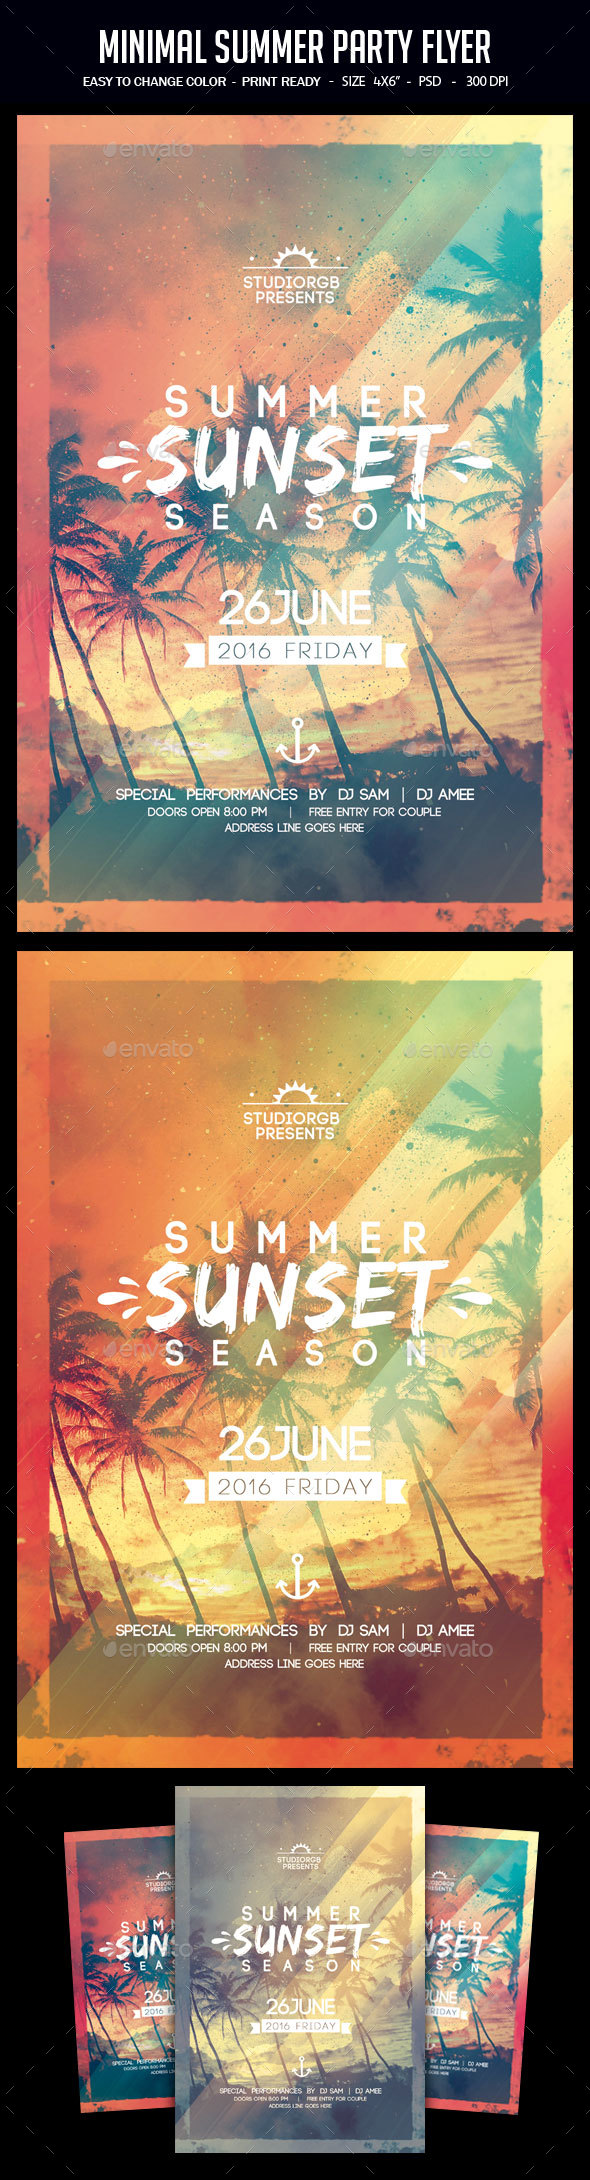 Minimal Summer Party Flyer